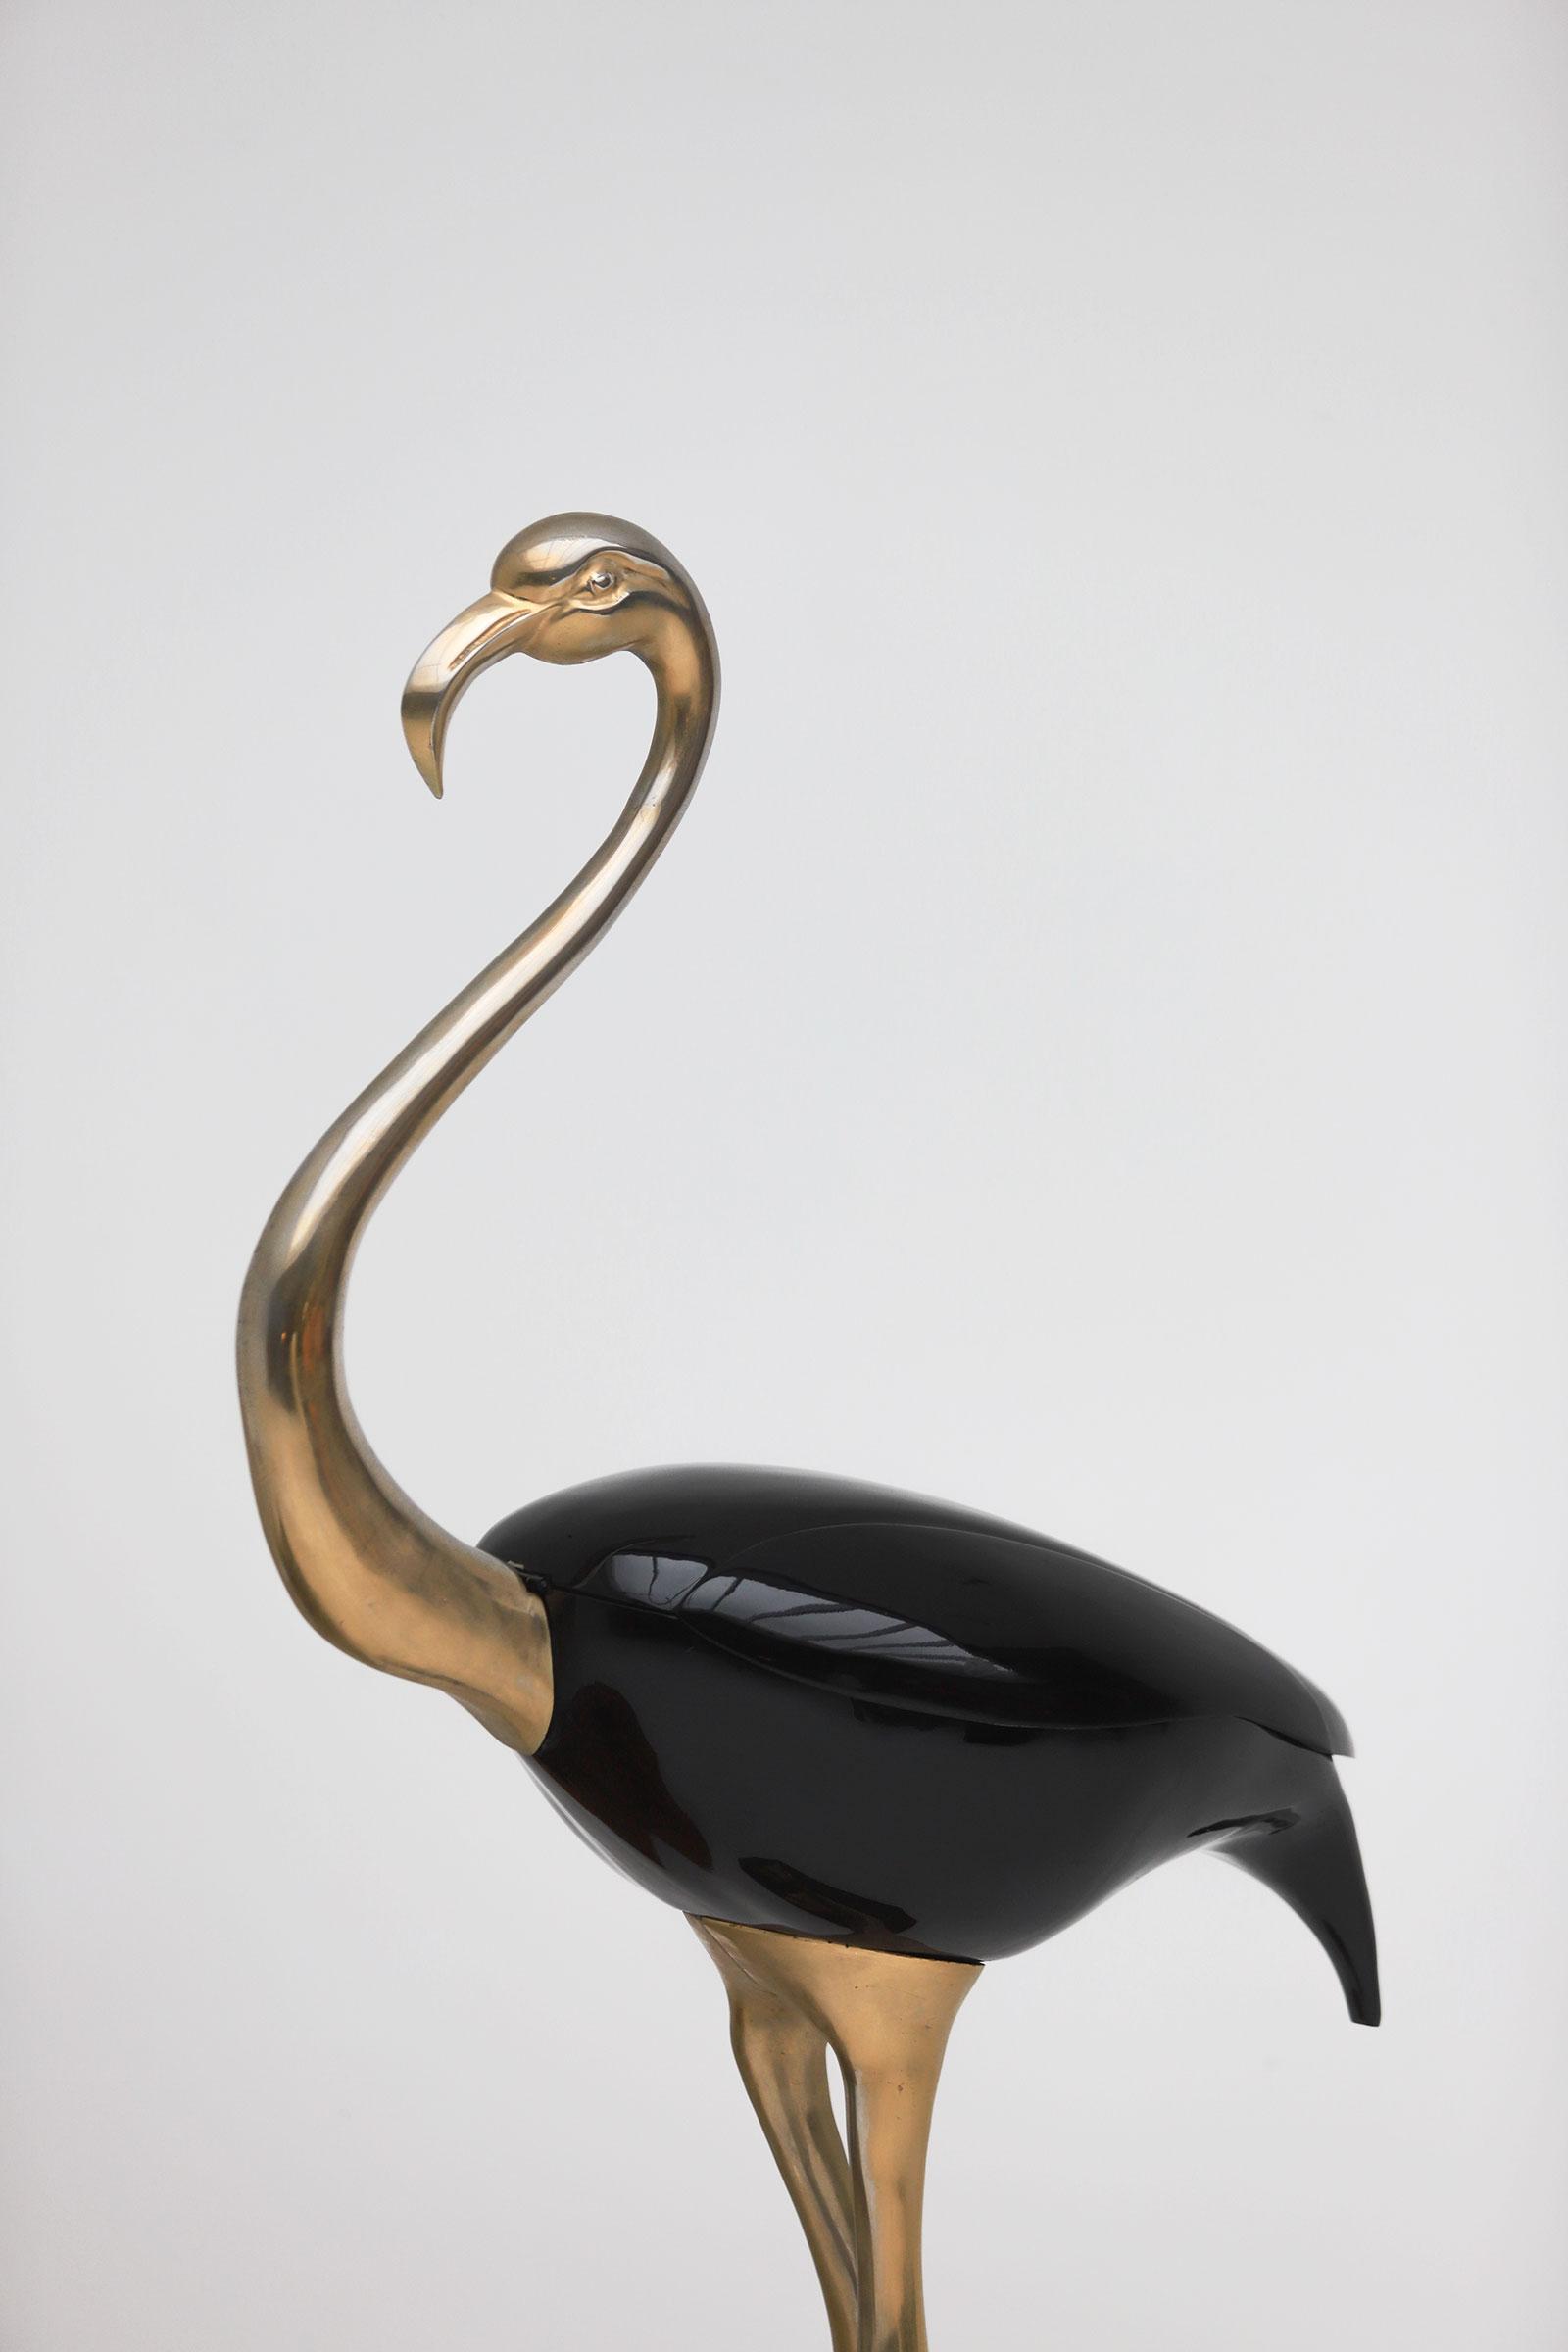 Fondica Lifesize Brass Flamingo 1970simage 16